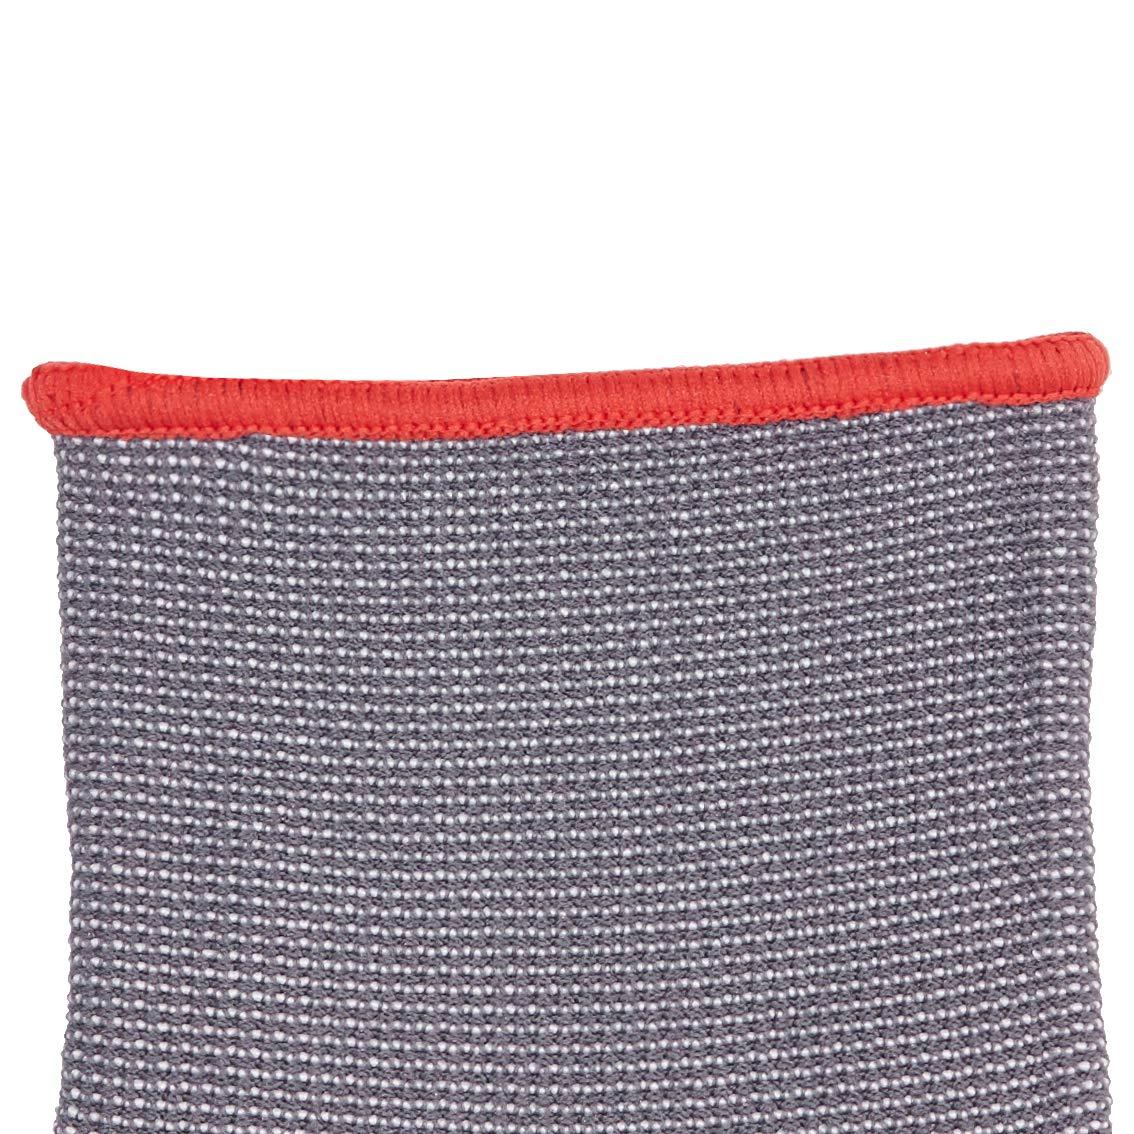 AmazonBasics Micro-Foam Nitrile Coated Work Gloves, Nylon Liner Fiber, Touch Screen, Grey, Size 9, L, 12-Pair by AmazonBasics (Image #7)